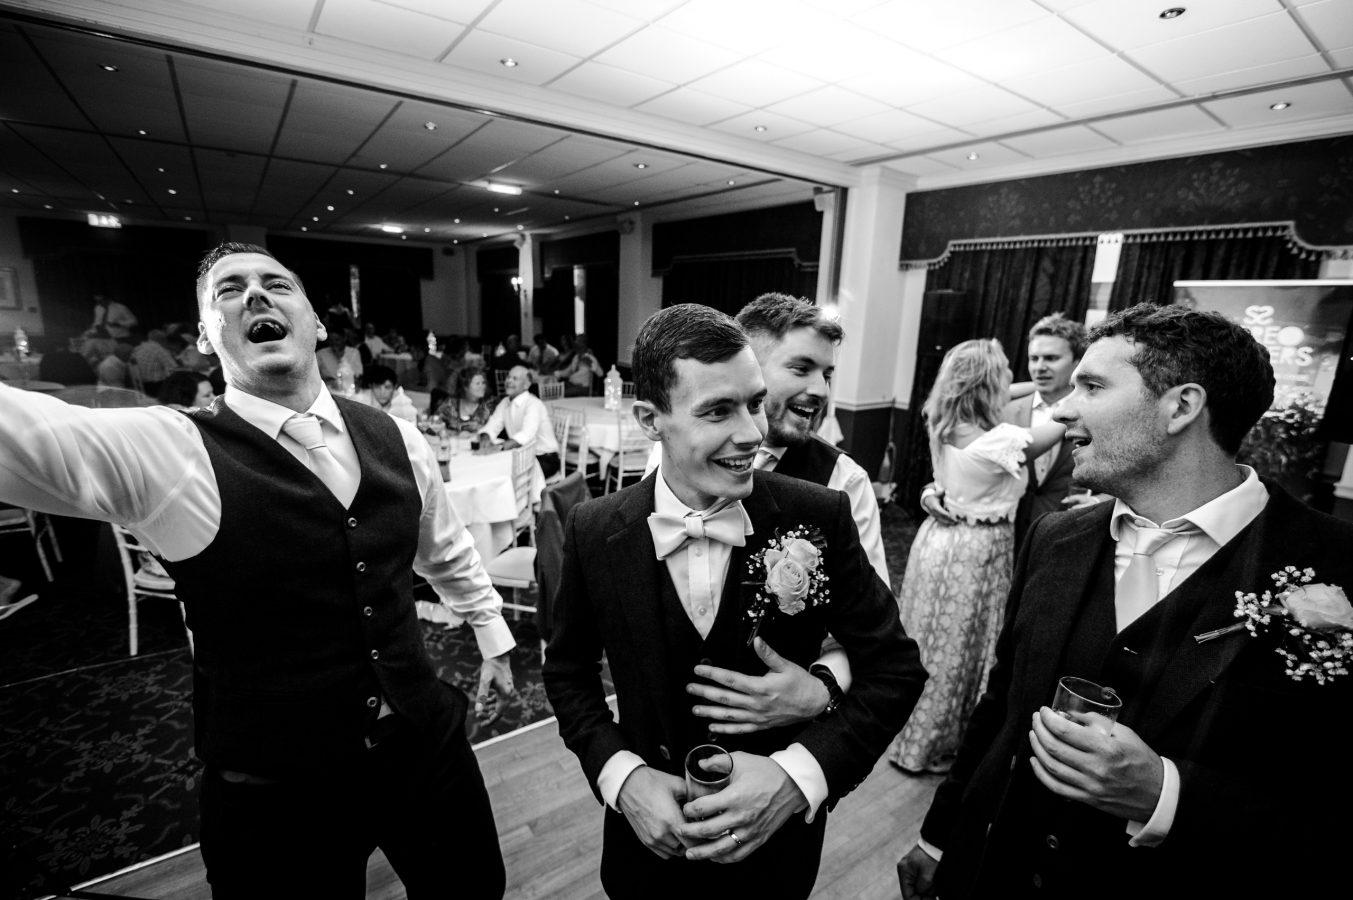 grooms-men-on-the-dance-floor-dunkenhalgh-hotel